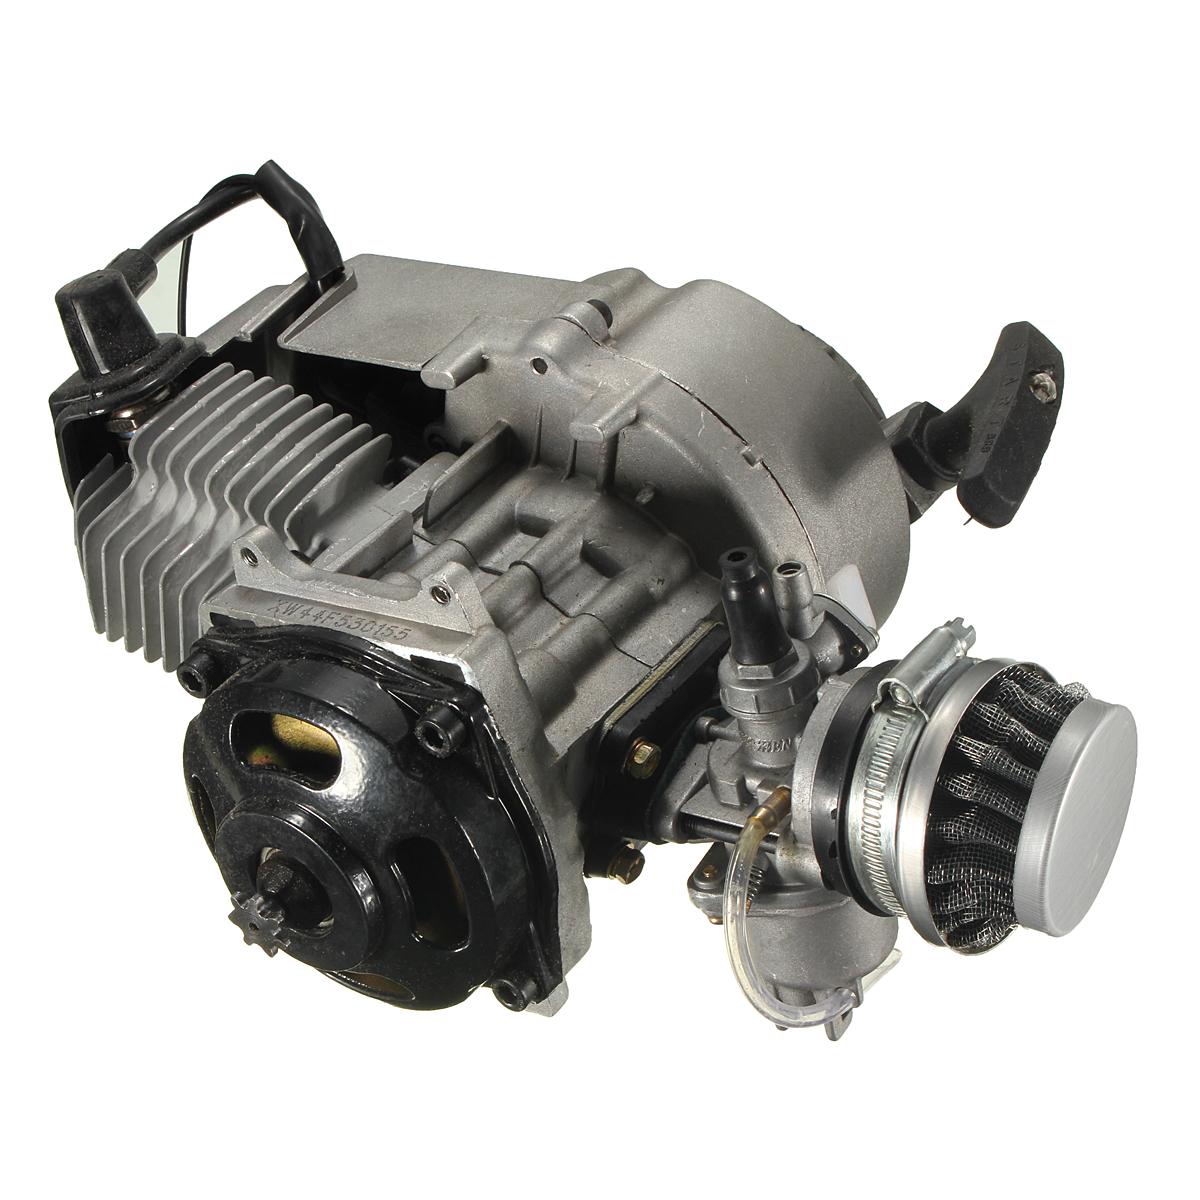 49cc Mini Moto Minimoto Bike Quad Engine W Pullstart Carburettor Wiring Harness Scam Detail Image